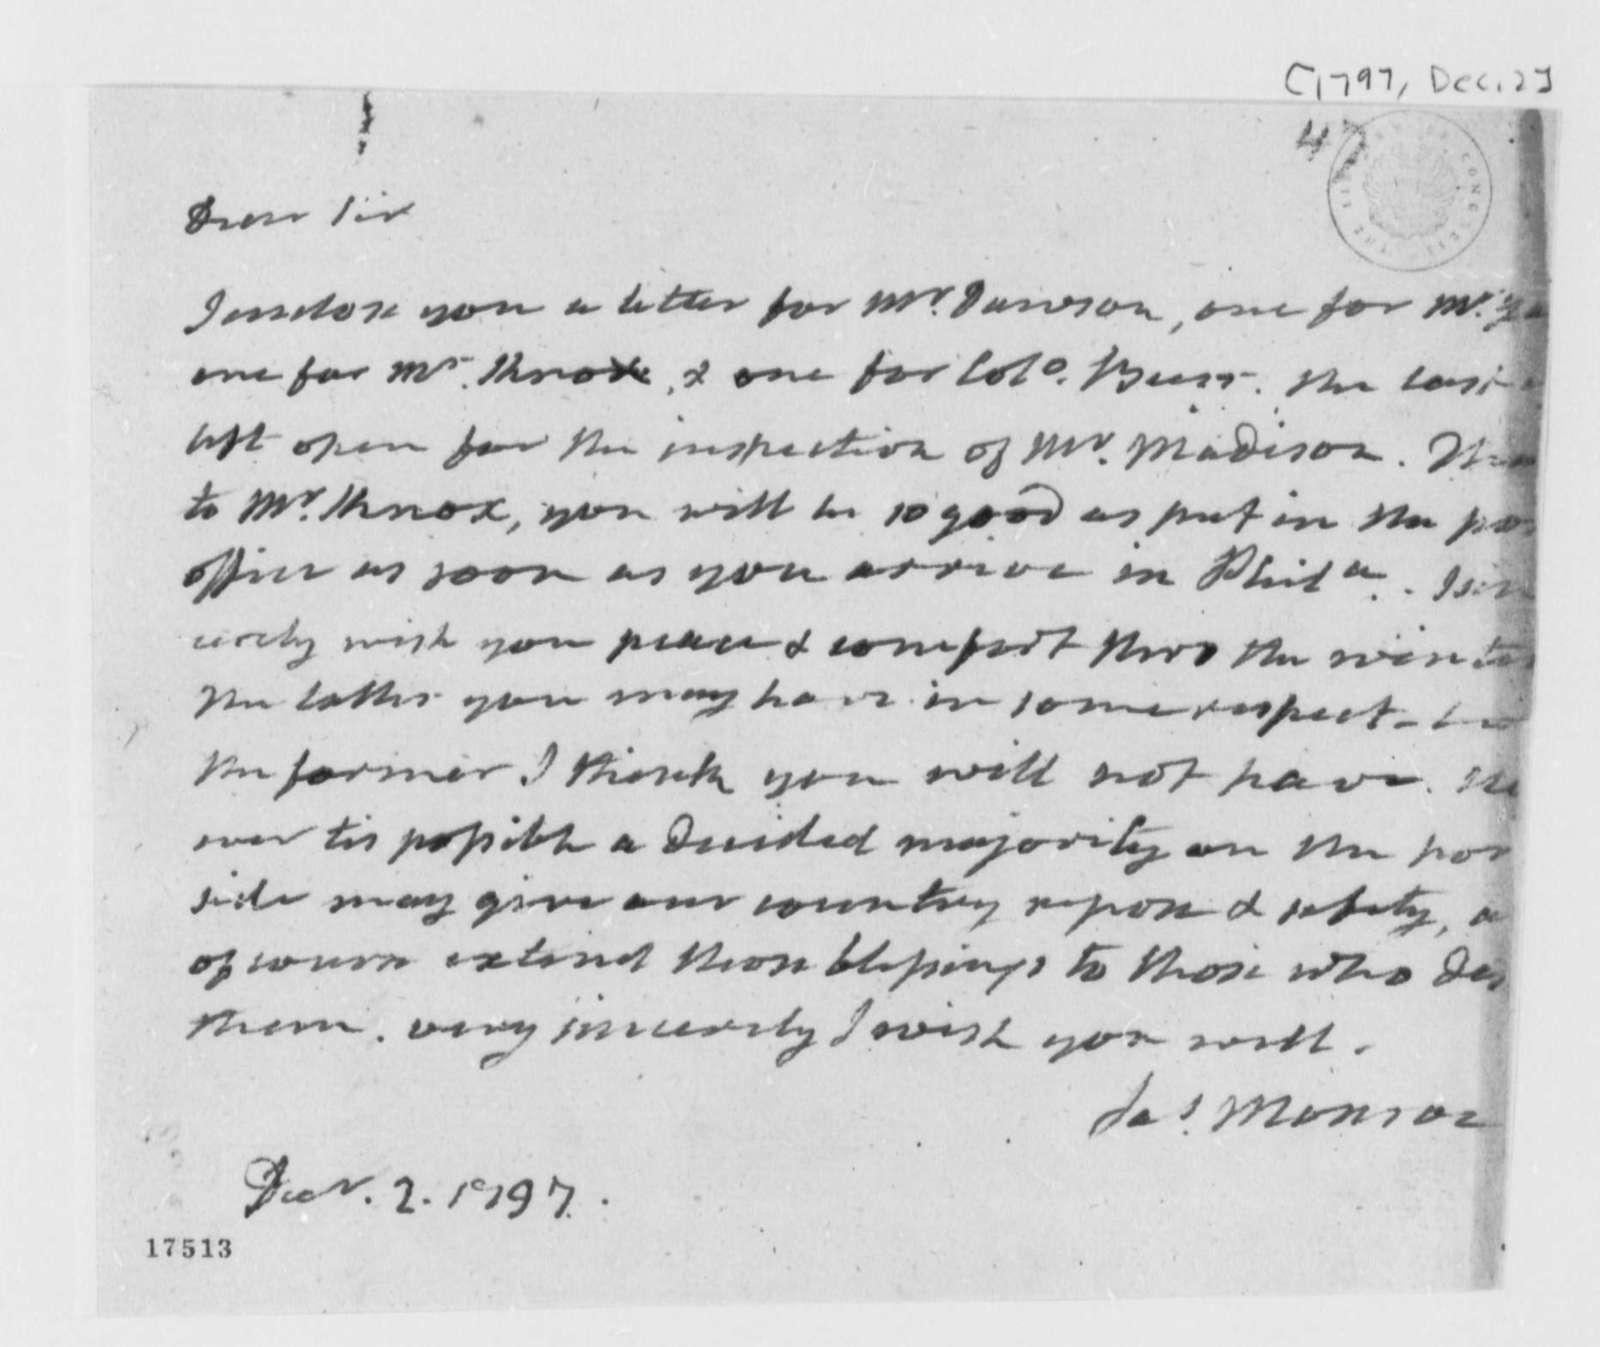 James Monroe to Thomas Jefferson, December 2, 1797